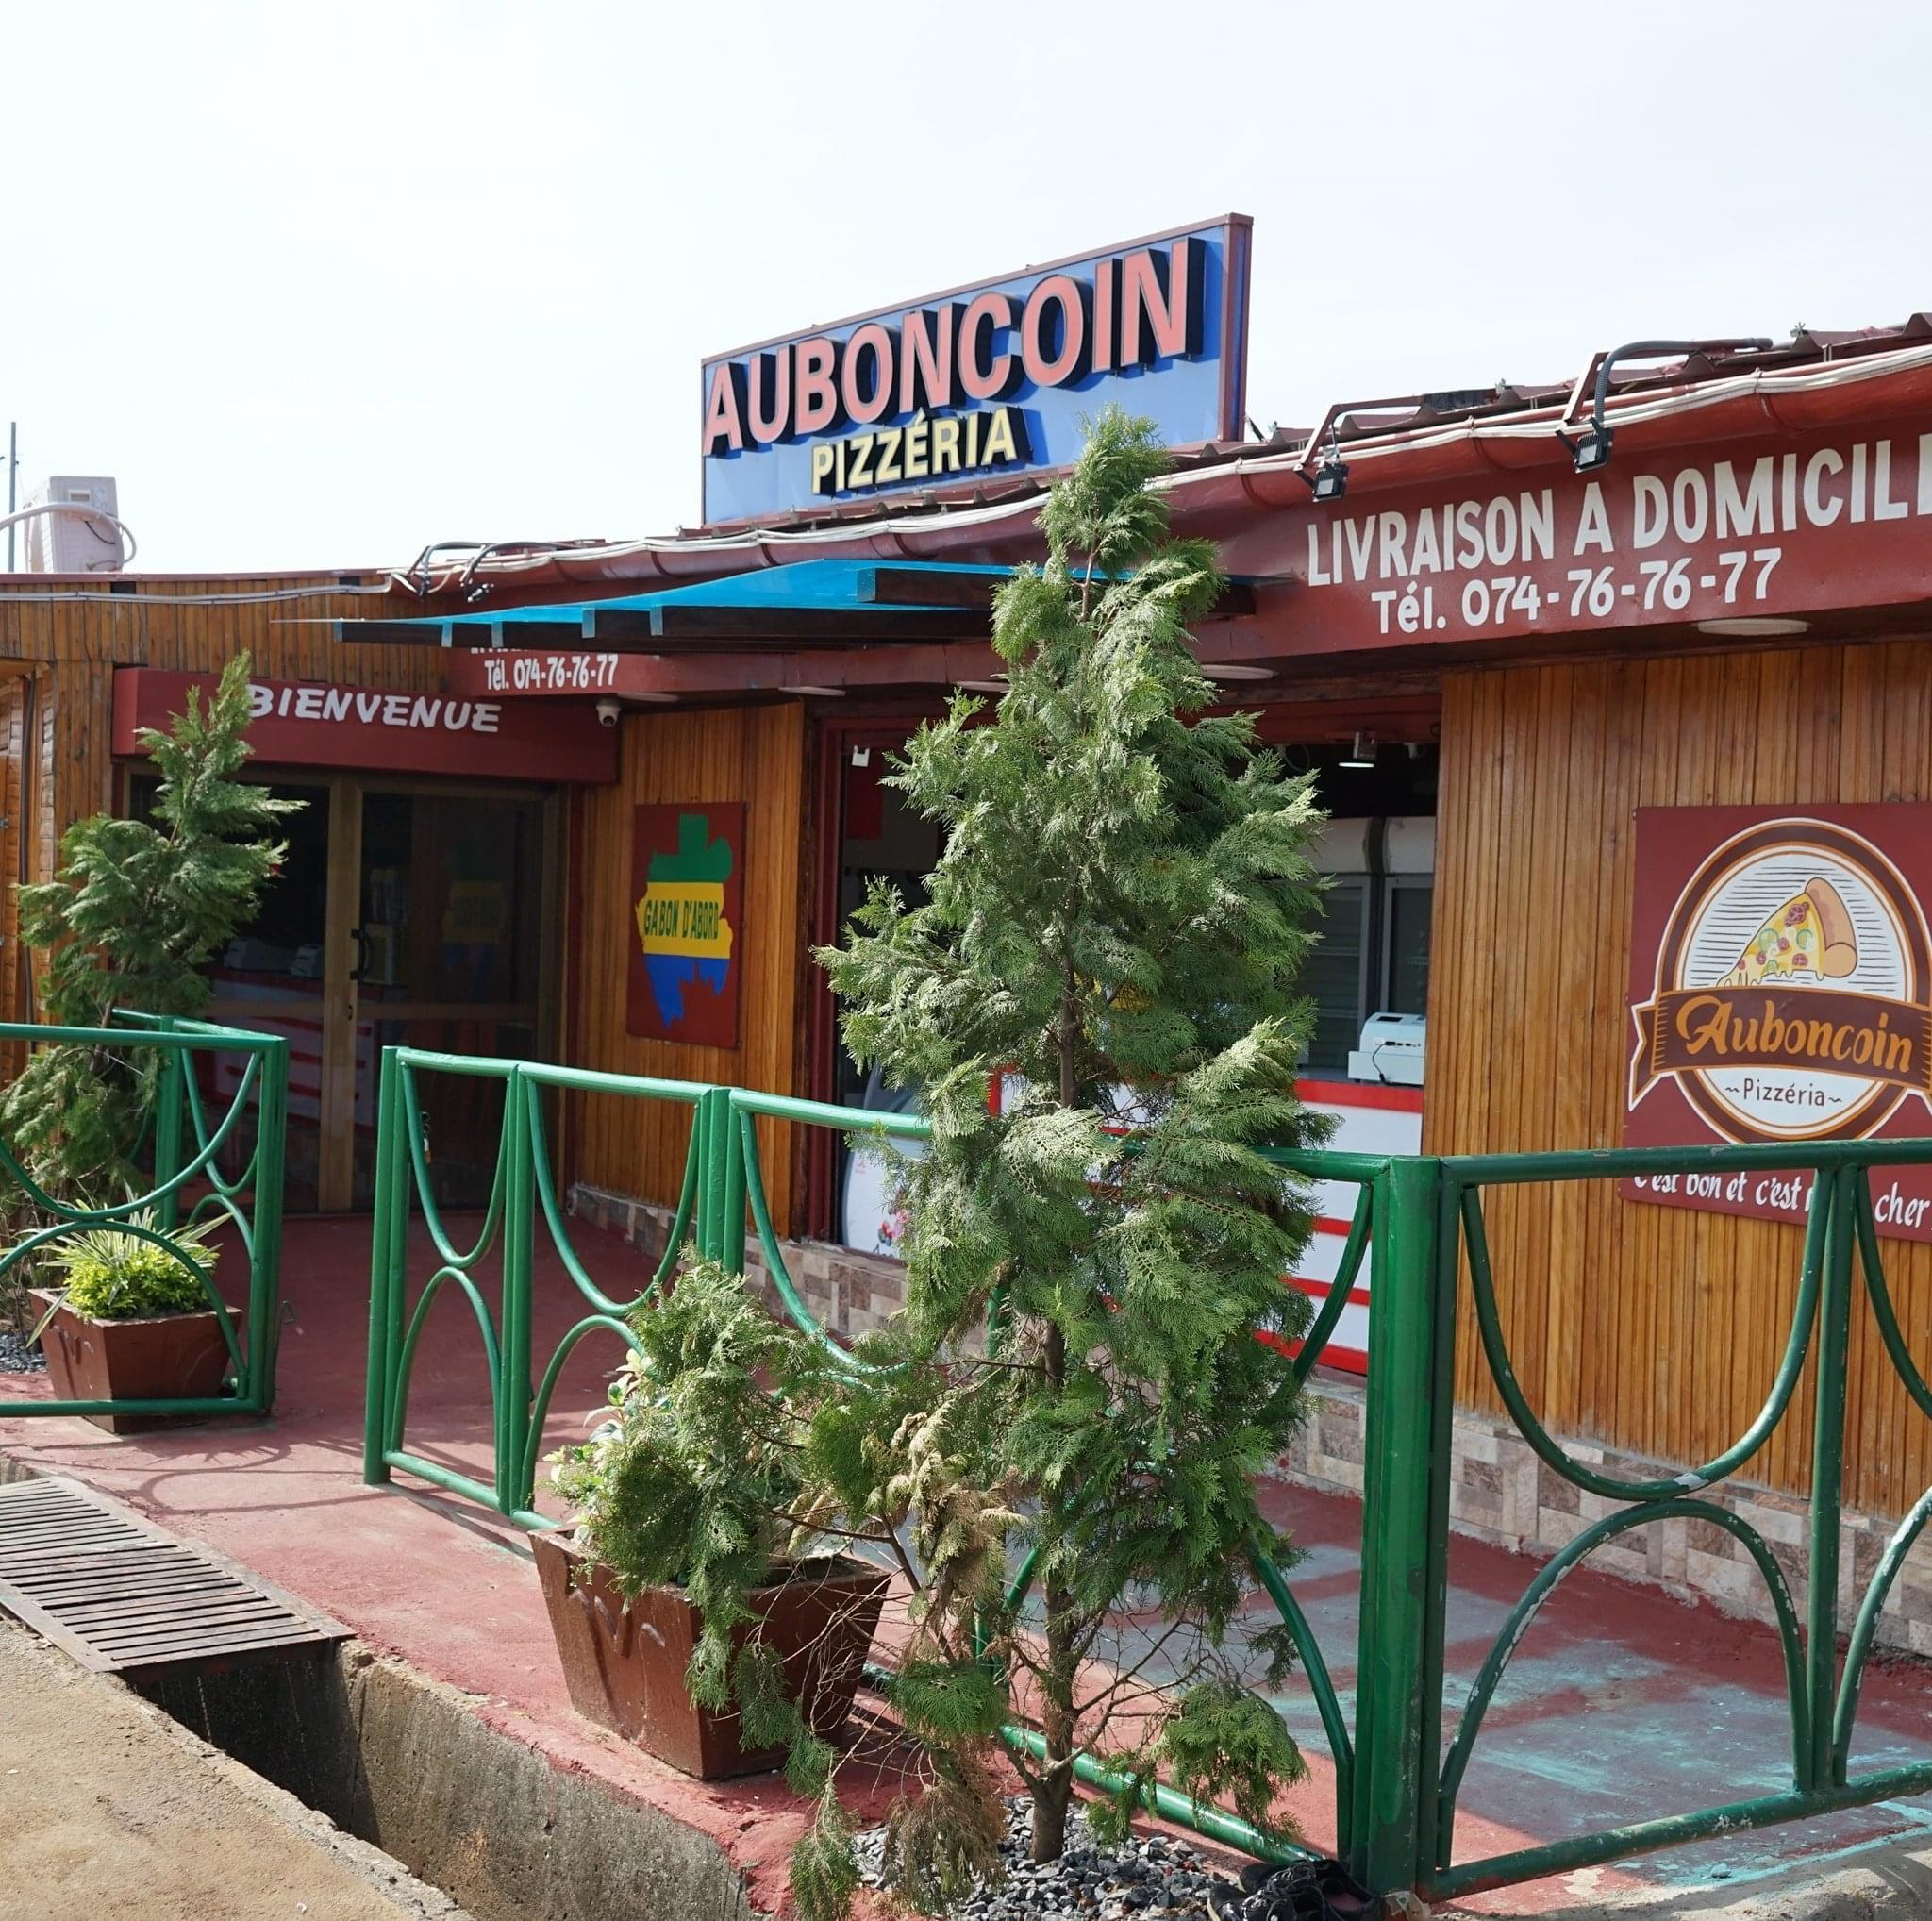 Auboncoin